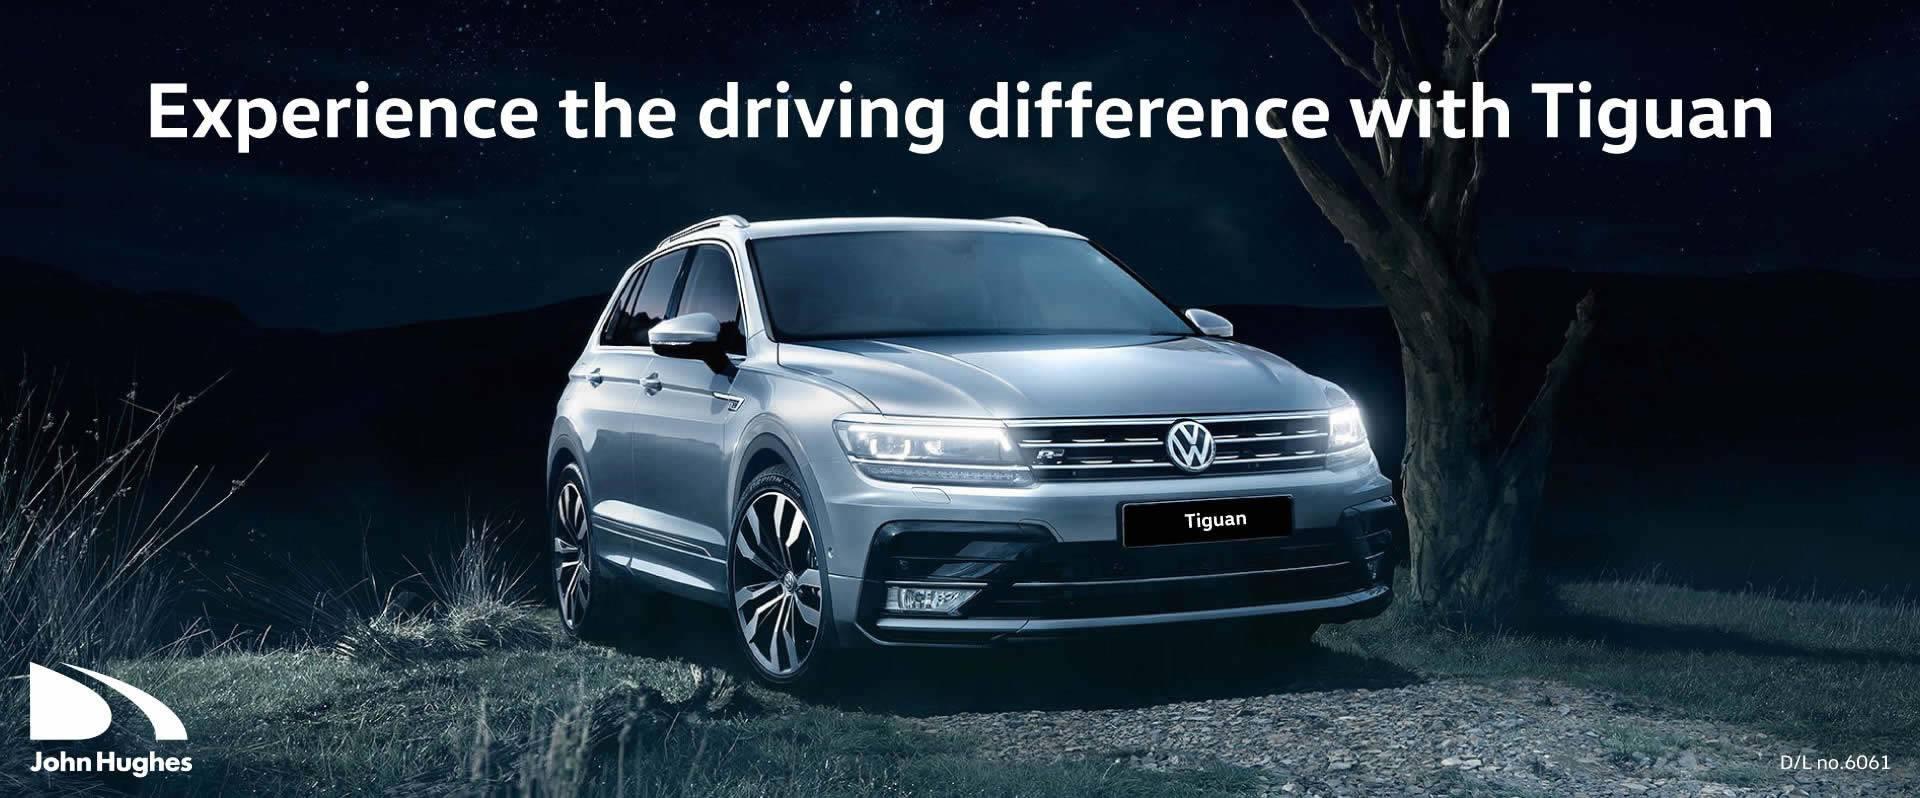 JohnHughes-VW-HPB-Tiguan-Aug17-SL